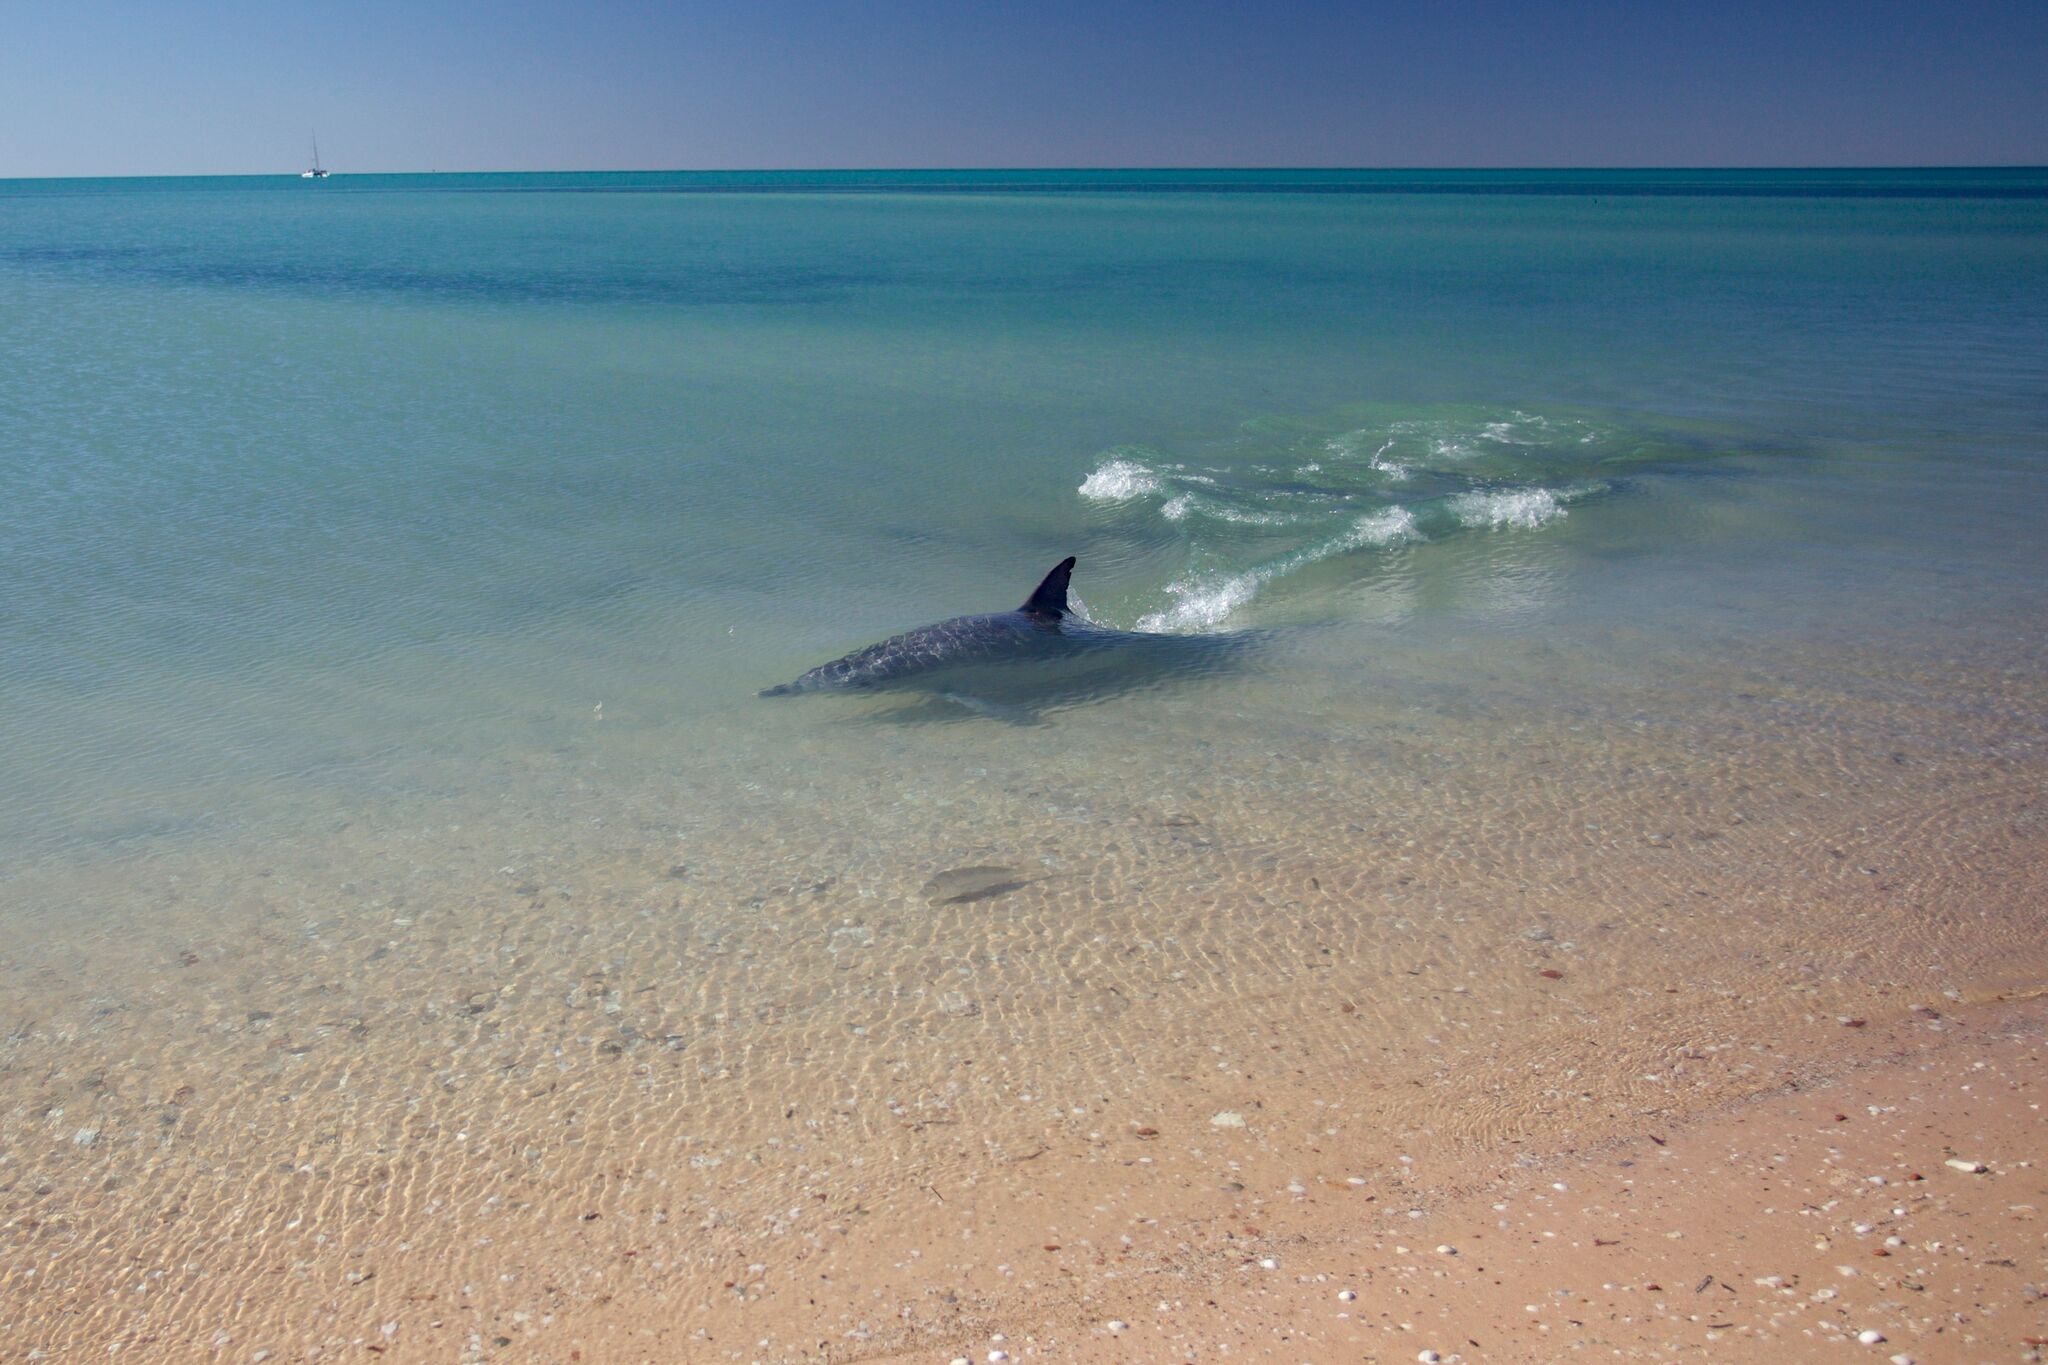 Piccalo pursues a fish by the beach at Monkey Mia  © Simon Allen